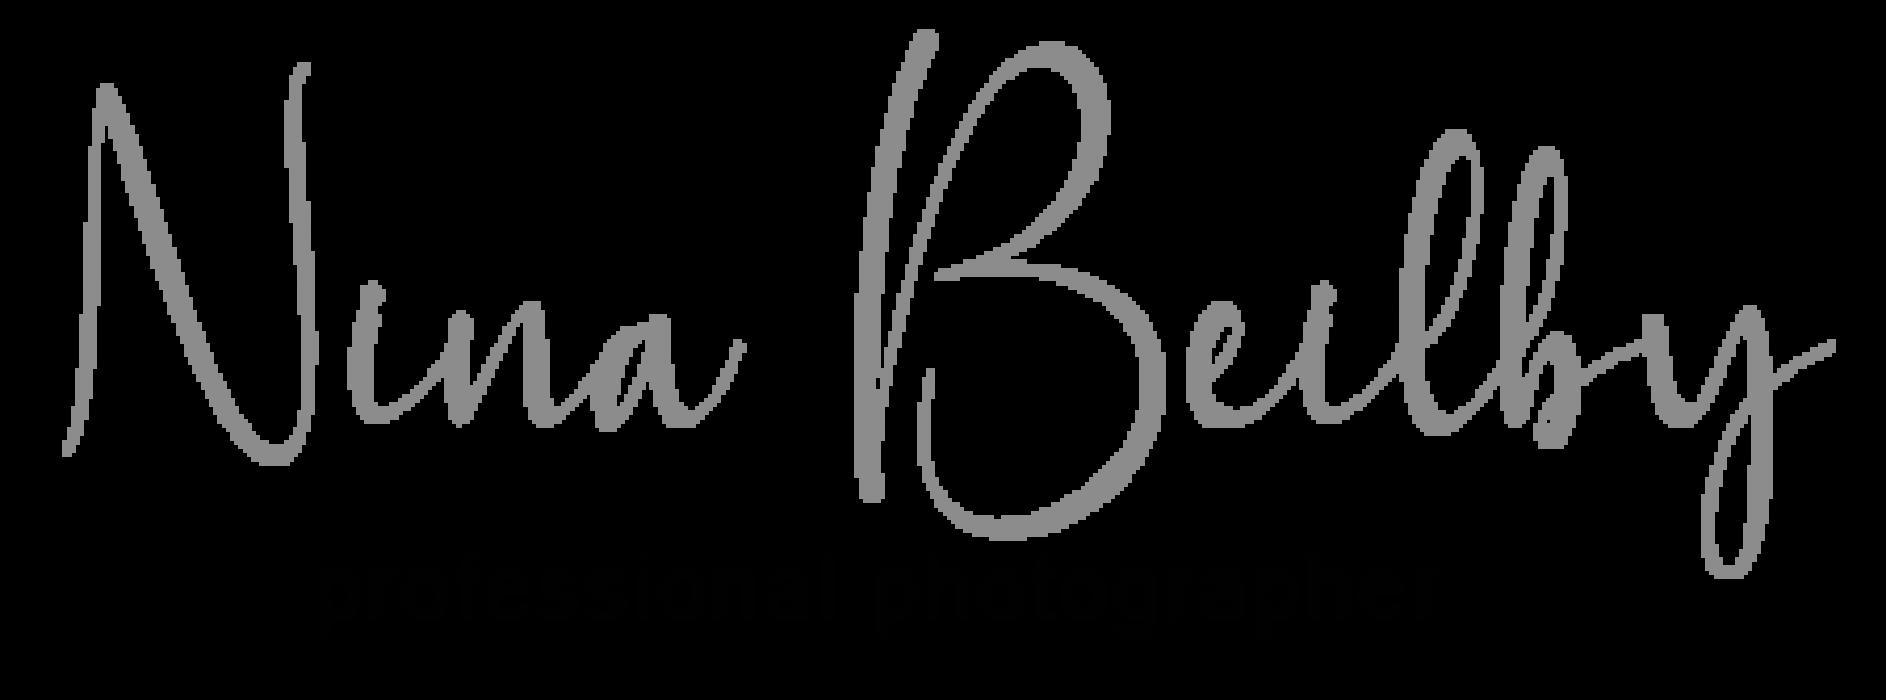 Logo-2020-black-1.5-inch